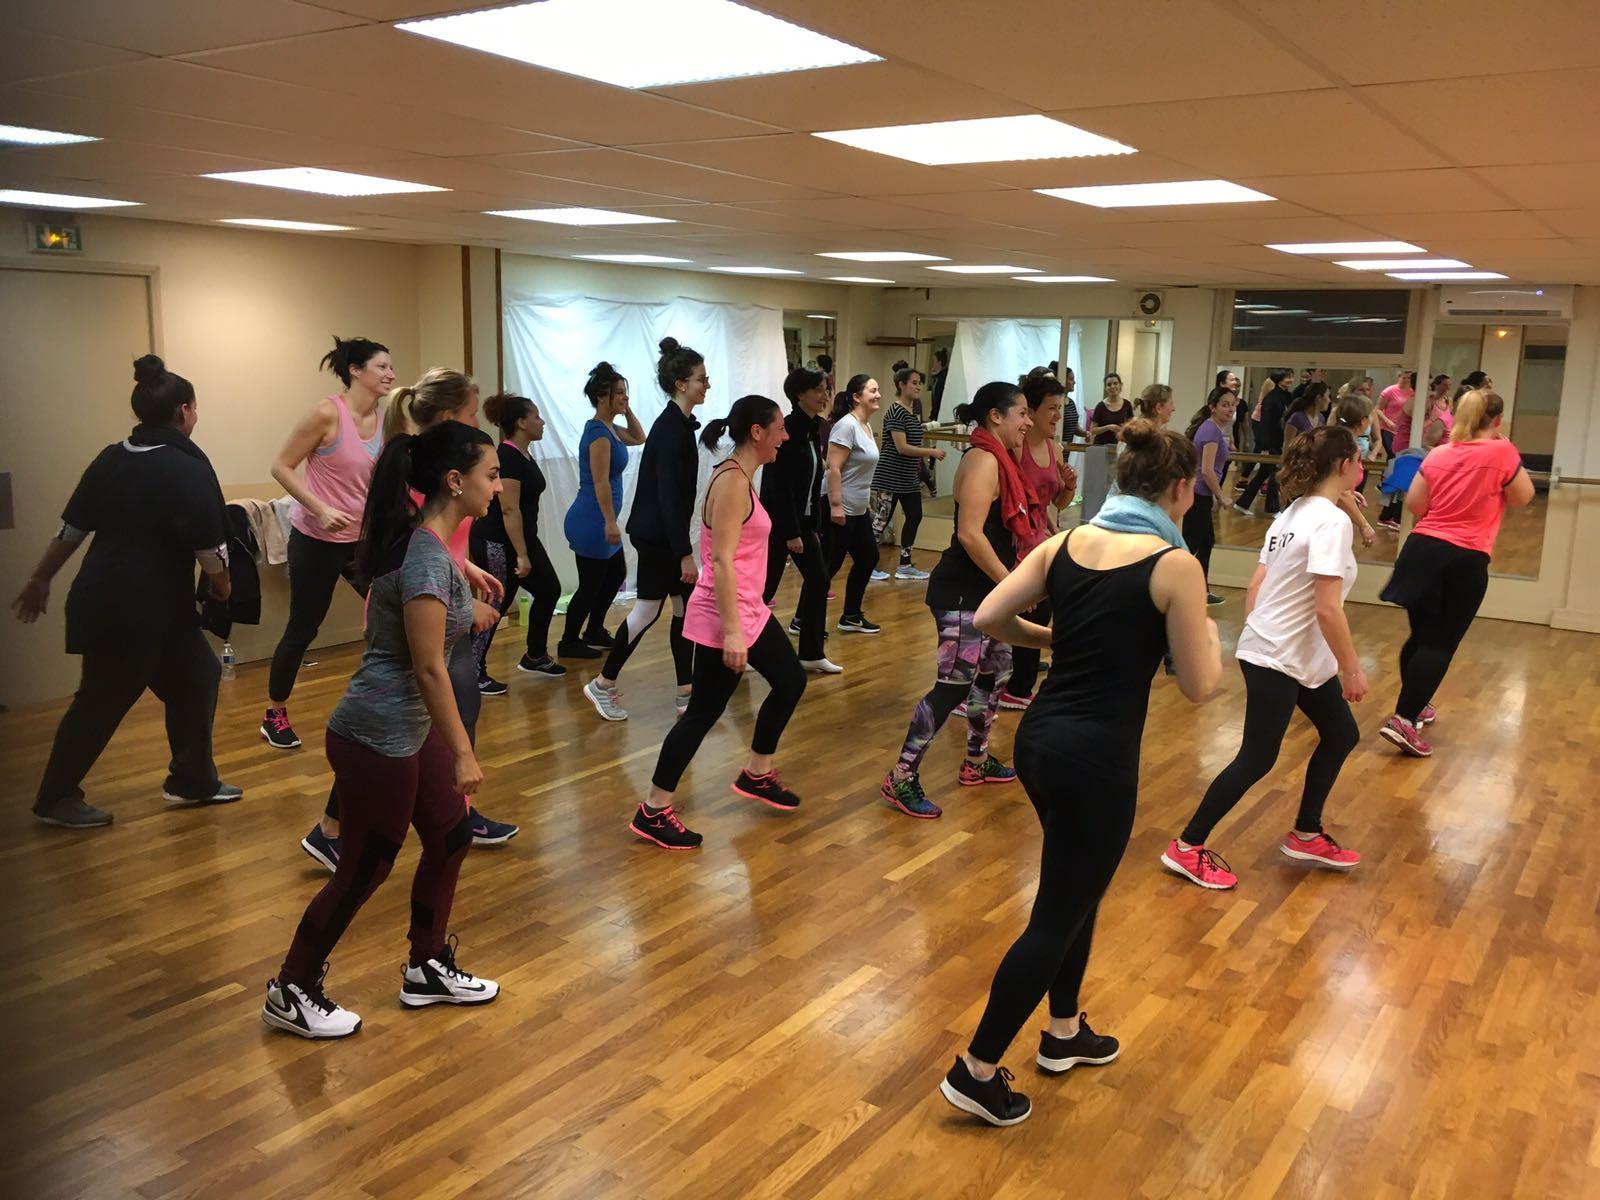 Fitness LIA cardio UMS danse umspc